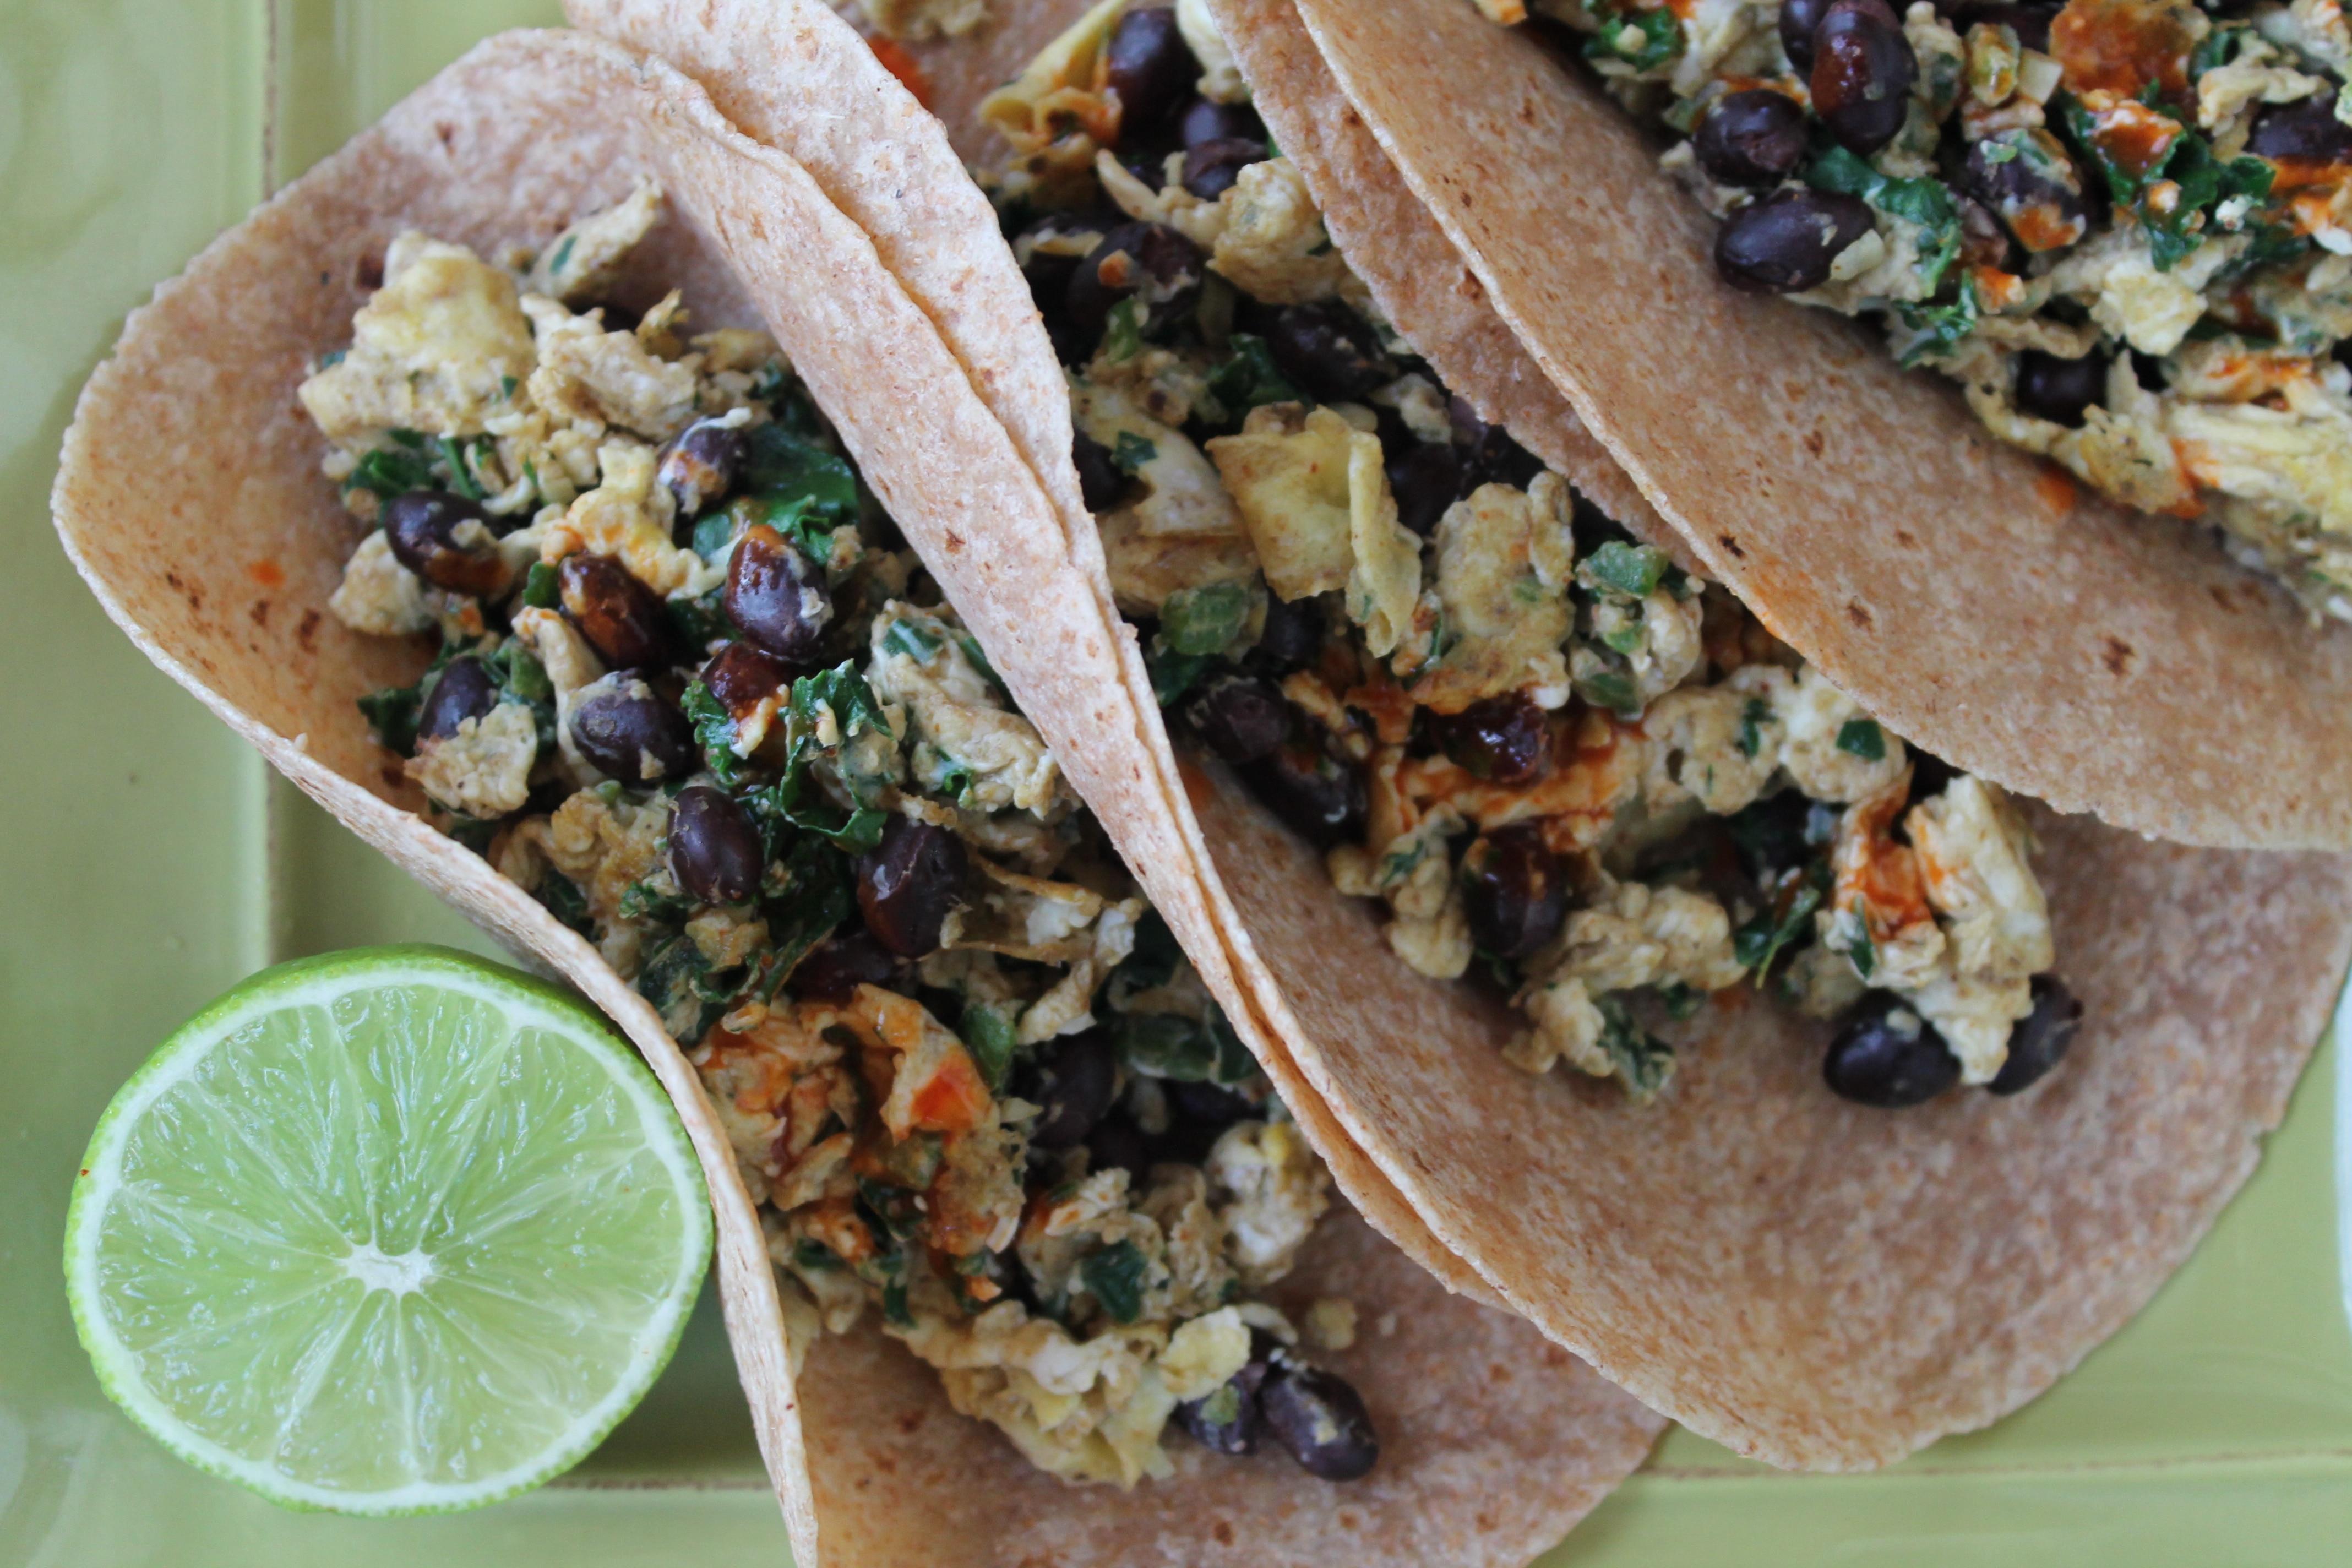 Kale Black Bean Jalapeño and Egg Breakfast Tacos